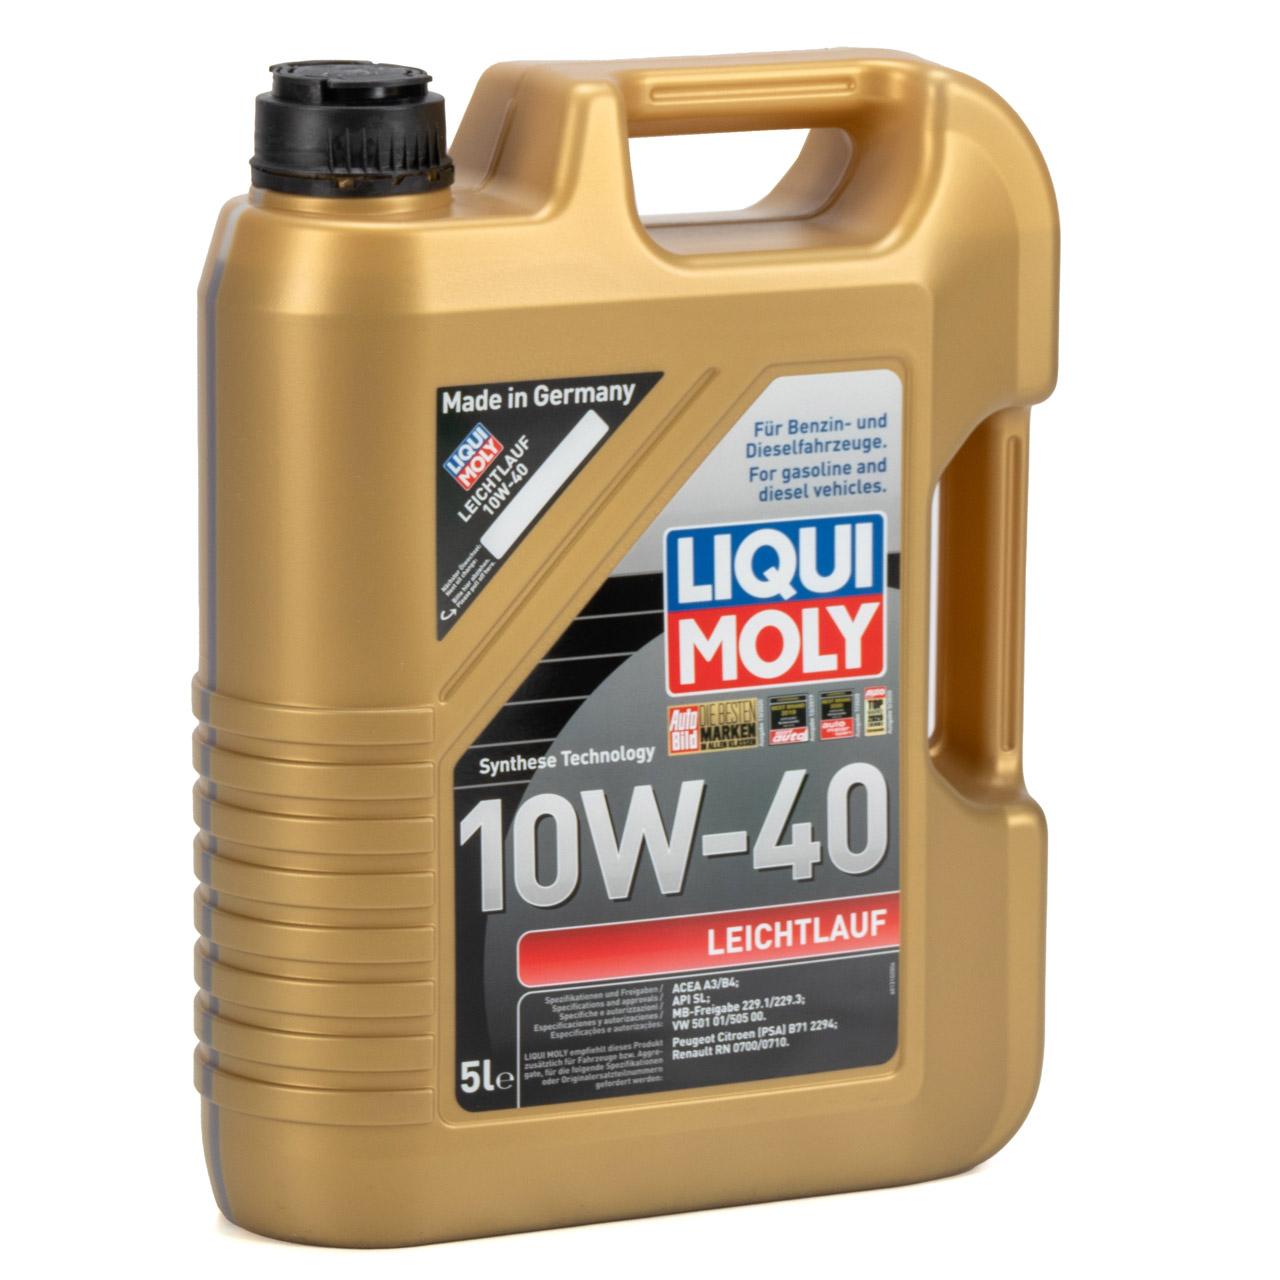 LIQUI MOLY Motoröl Öl Leichtlauf 10W40 MB 229.1/3 VW 501.01/505.00 - 5L 5 Liter